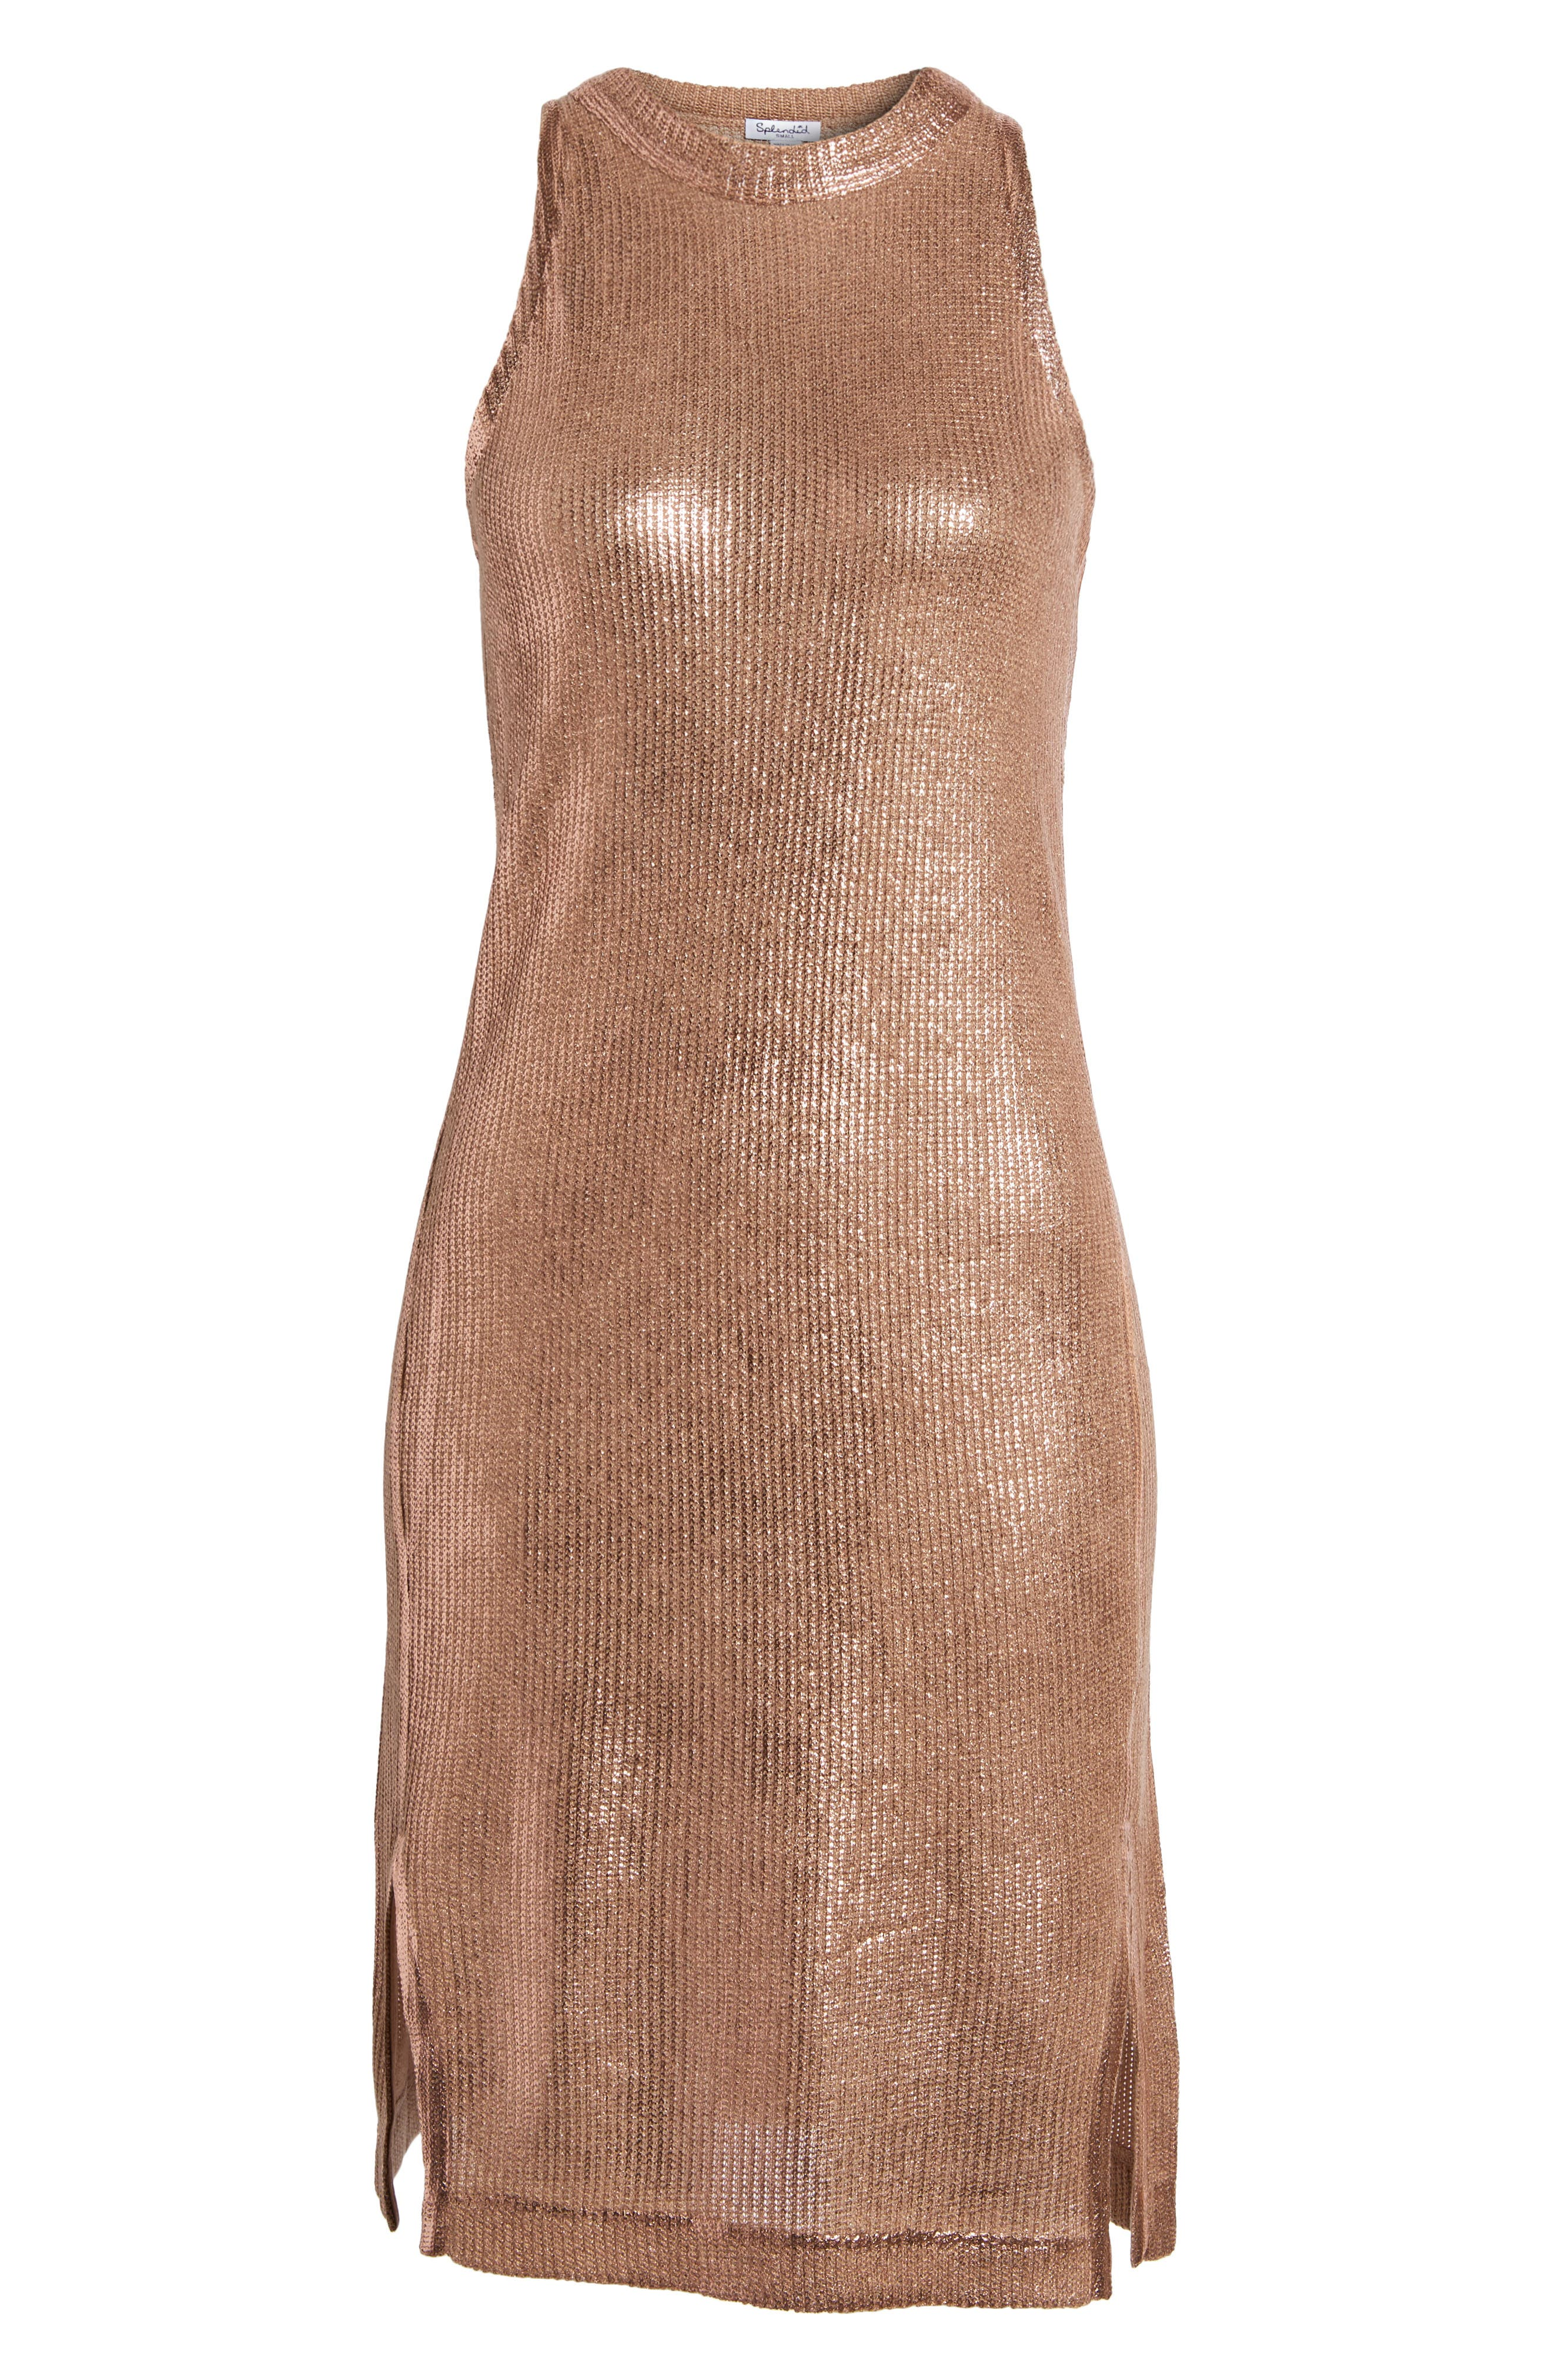 Metallic Coated Dress,                             Alternate thumbnail 12, color,